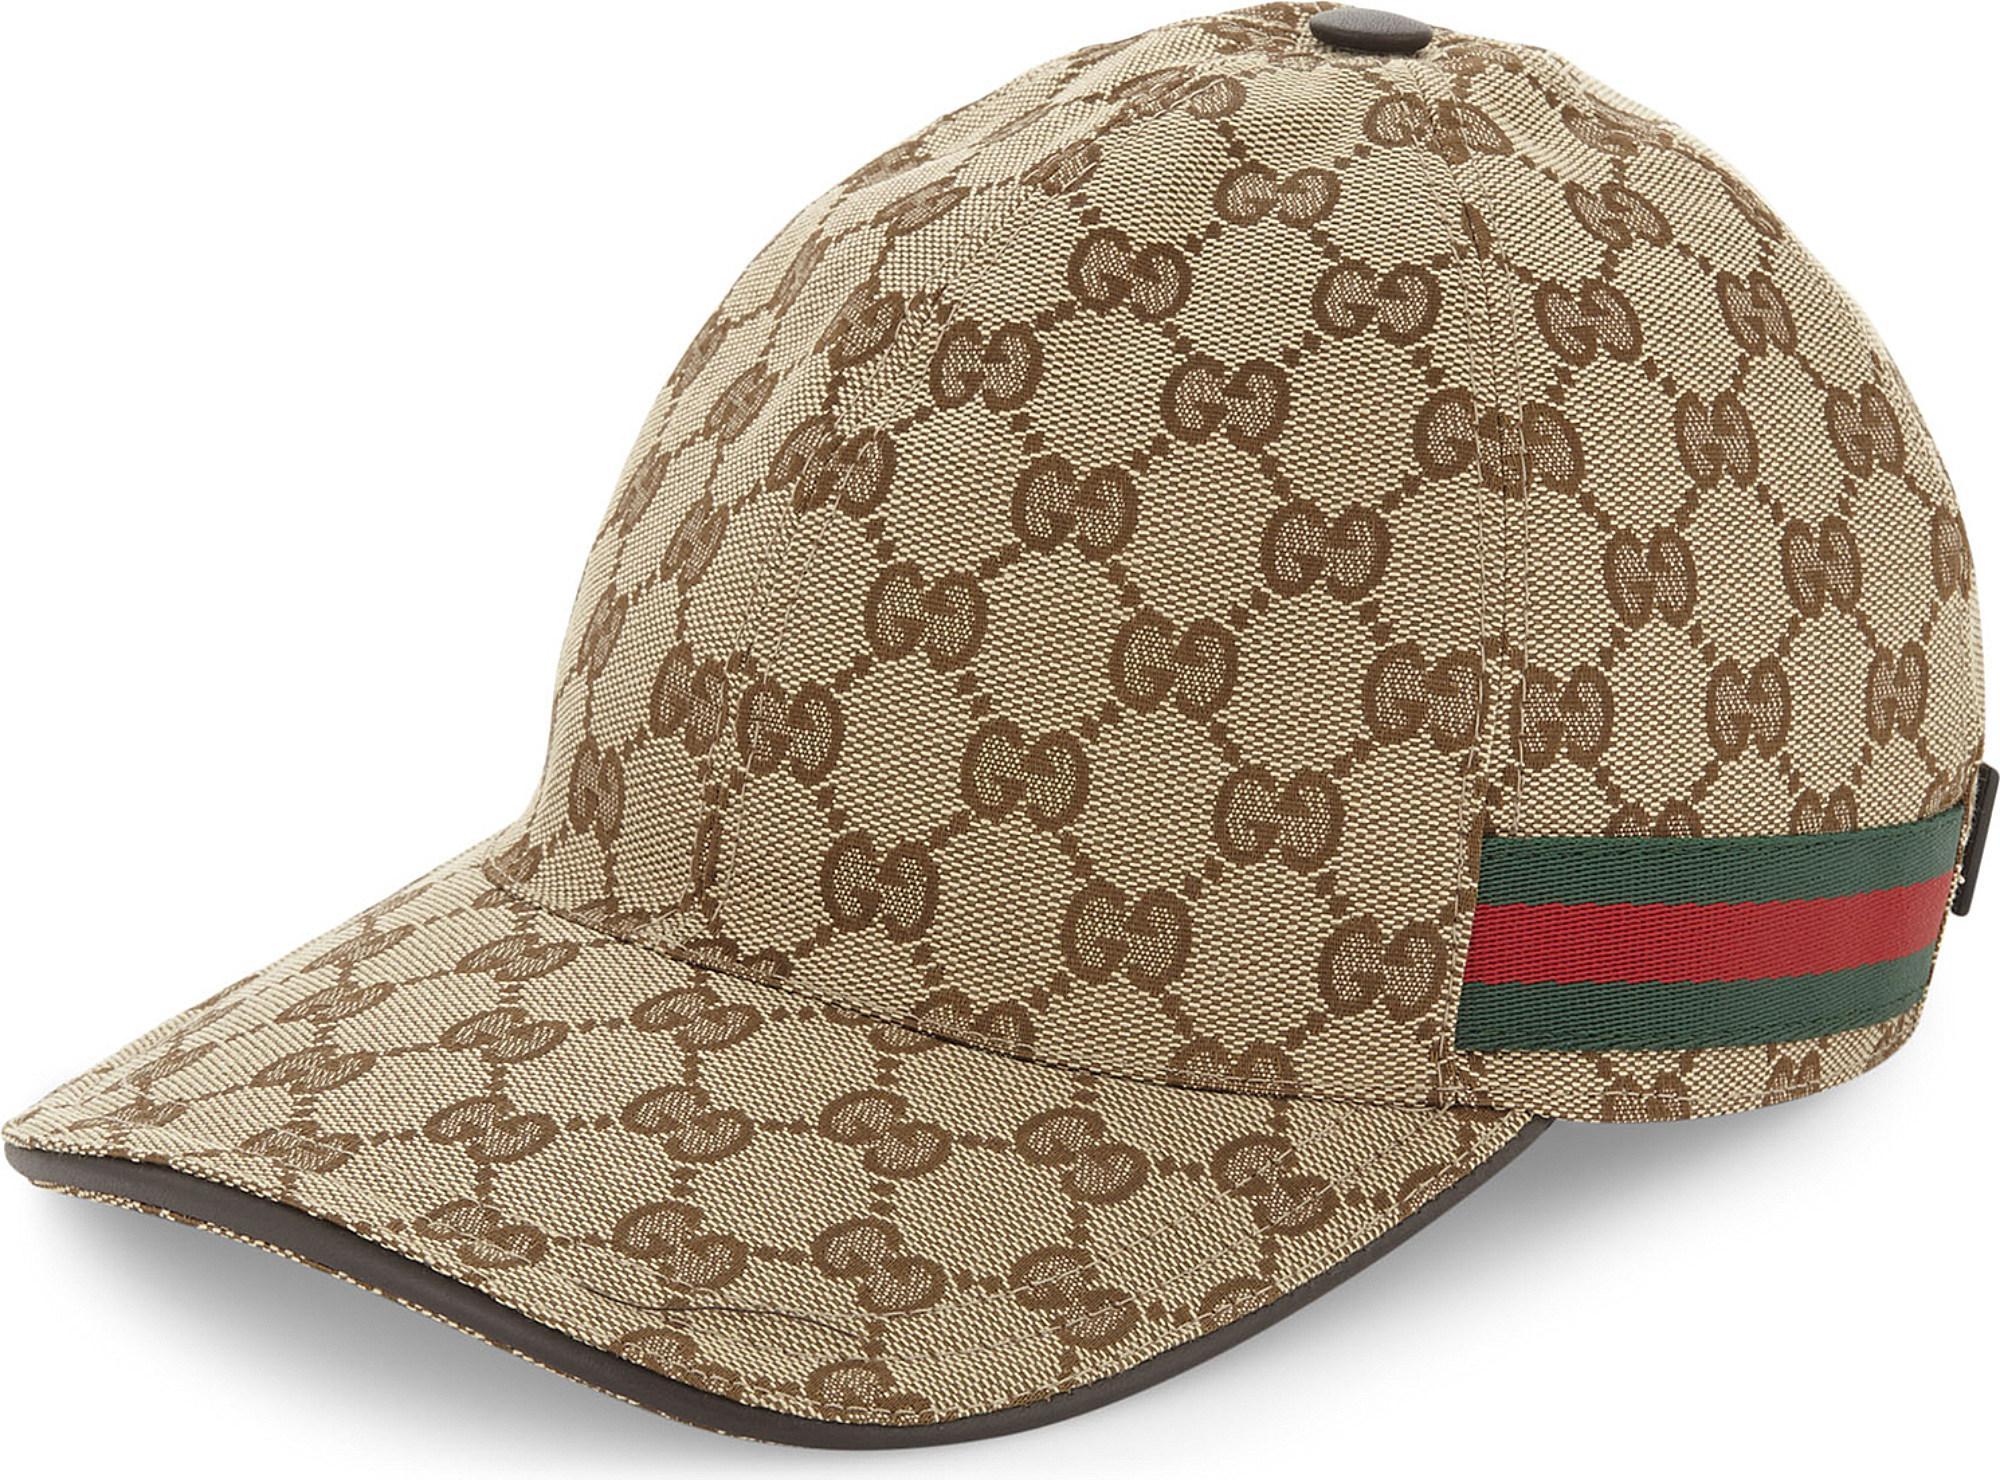 Gucci GG Web Stripe Baseball Cap in Brown for Men - Lyst 6a86fa90dd3